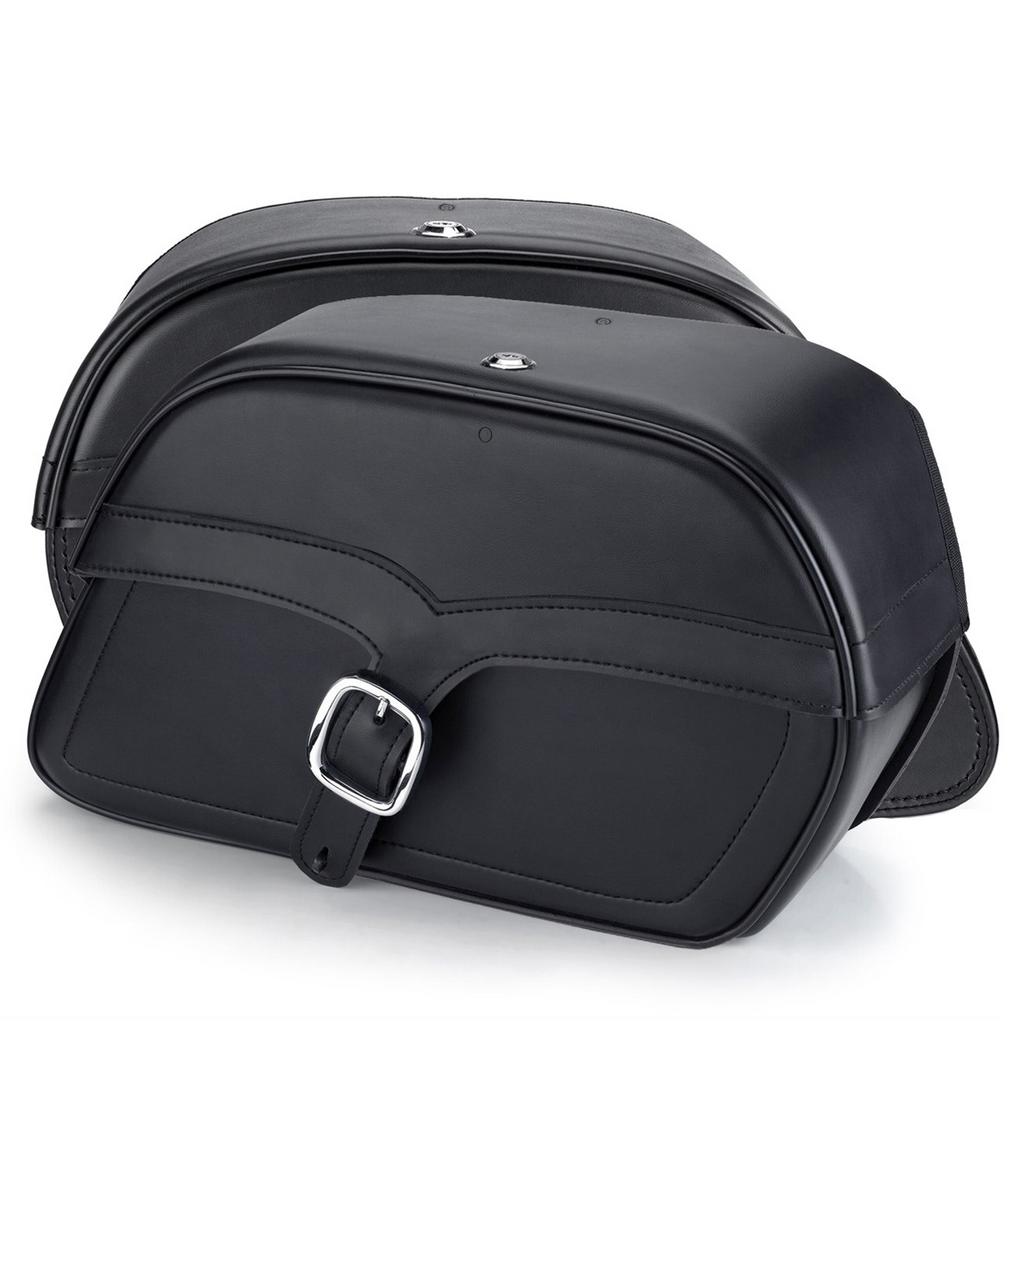 Victory Vegas Medium Charger Single Strap Motorcycle Saddlebags Both Bags View